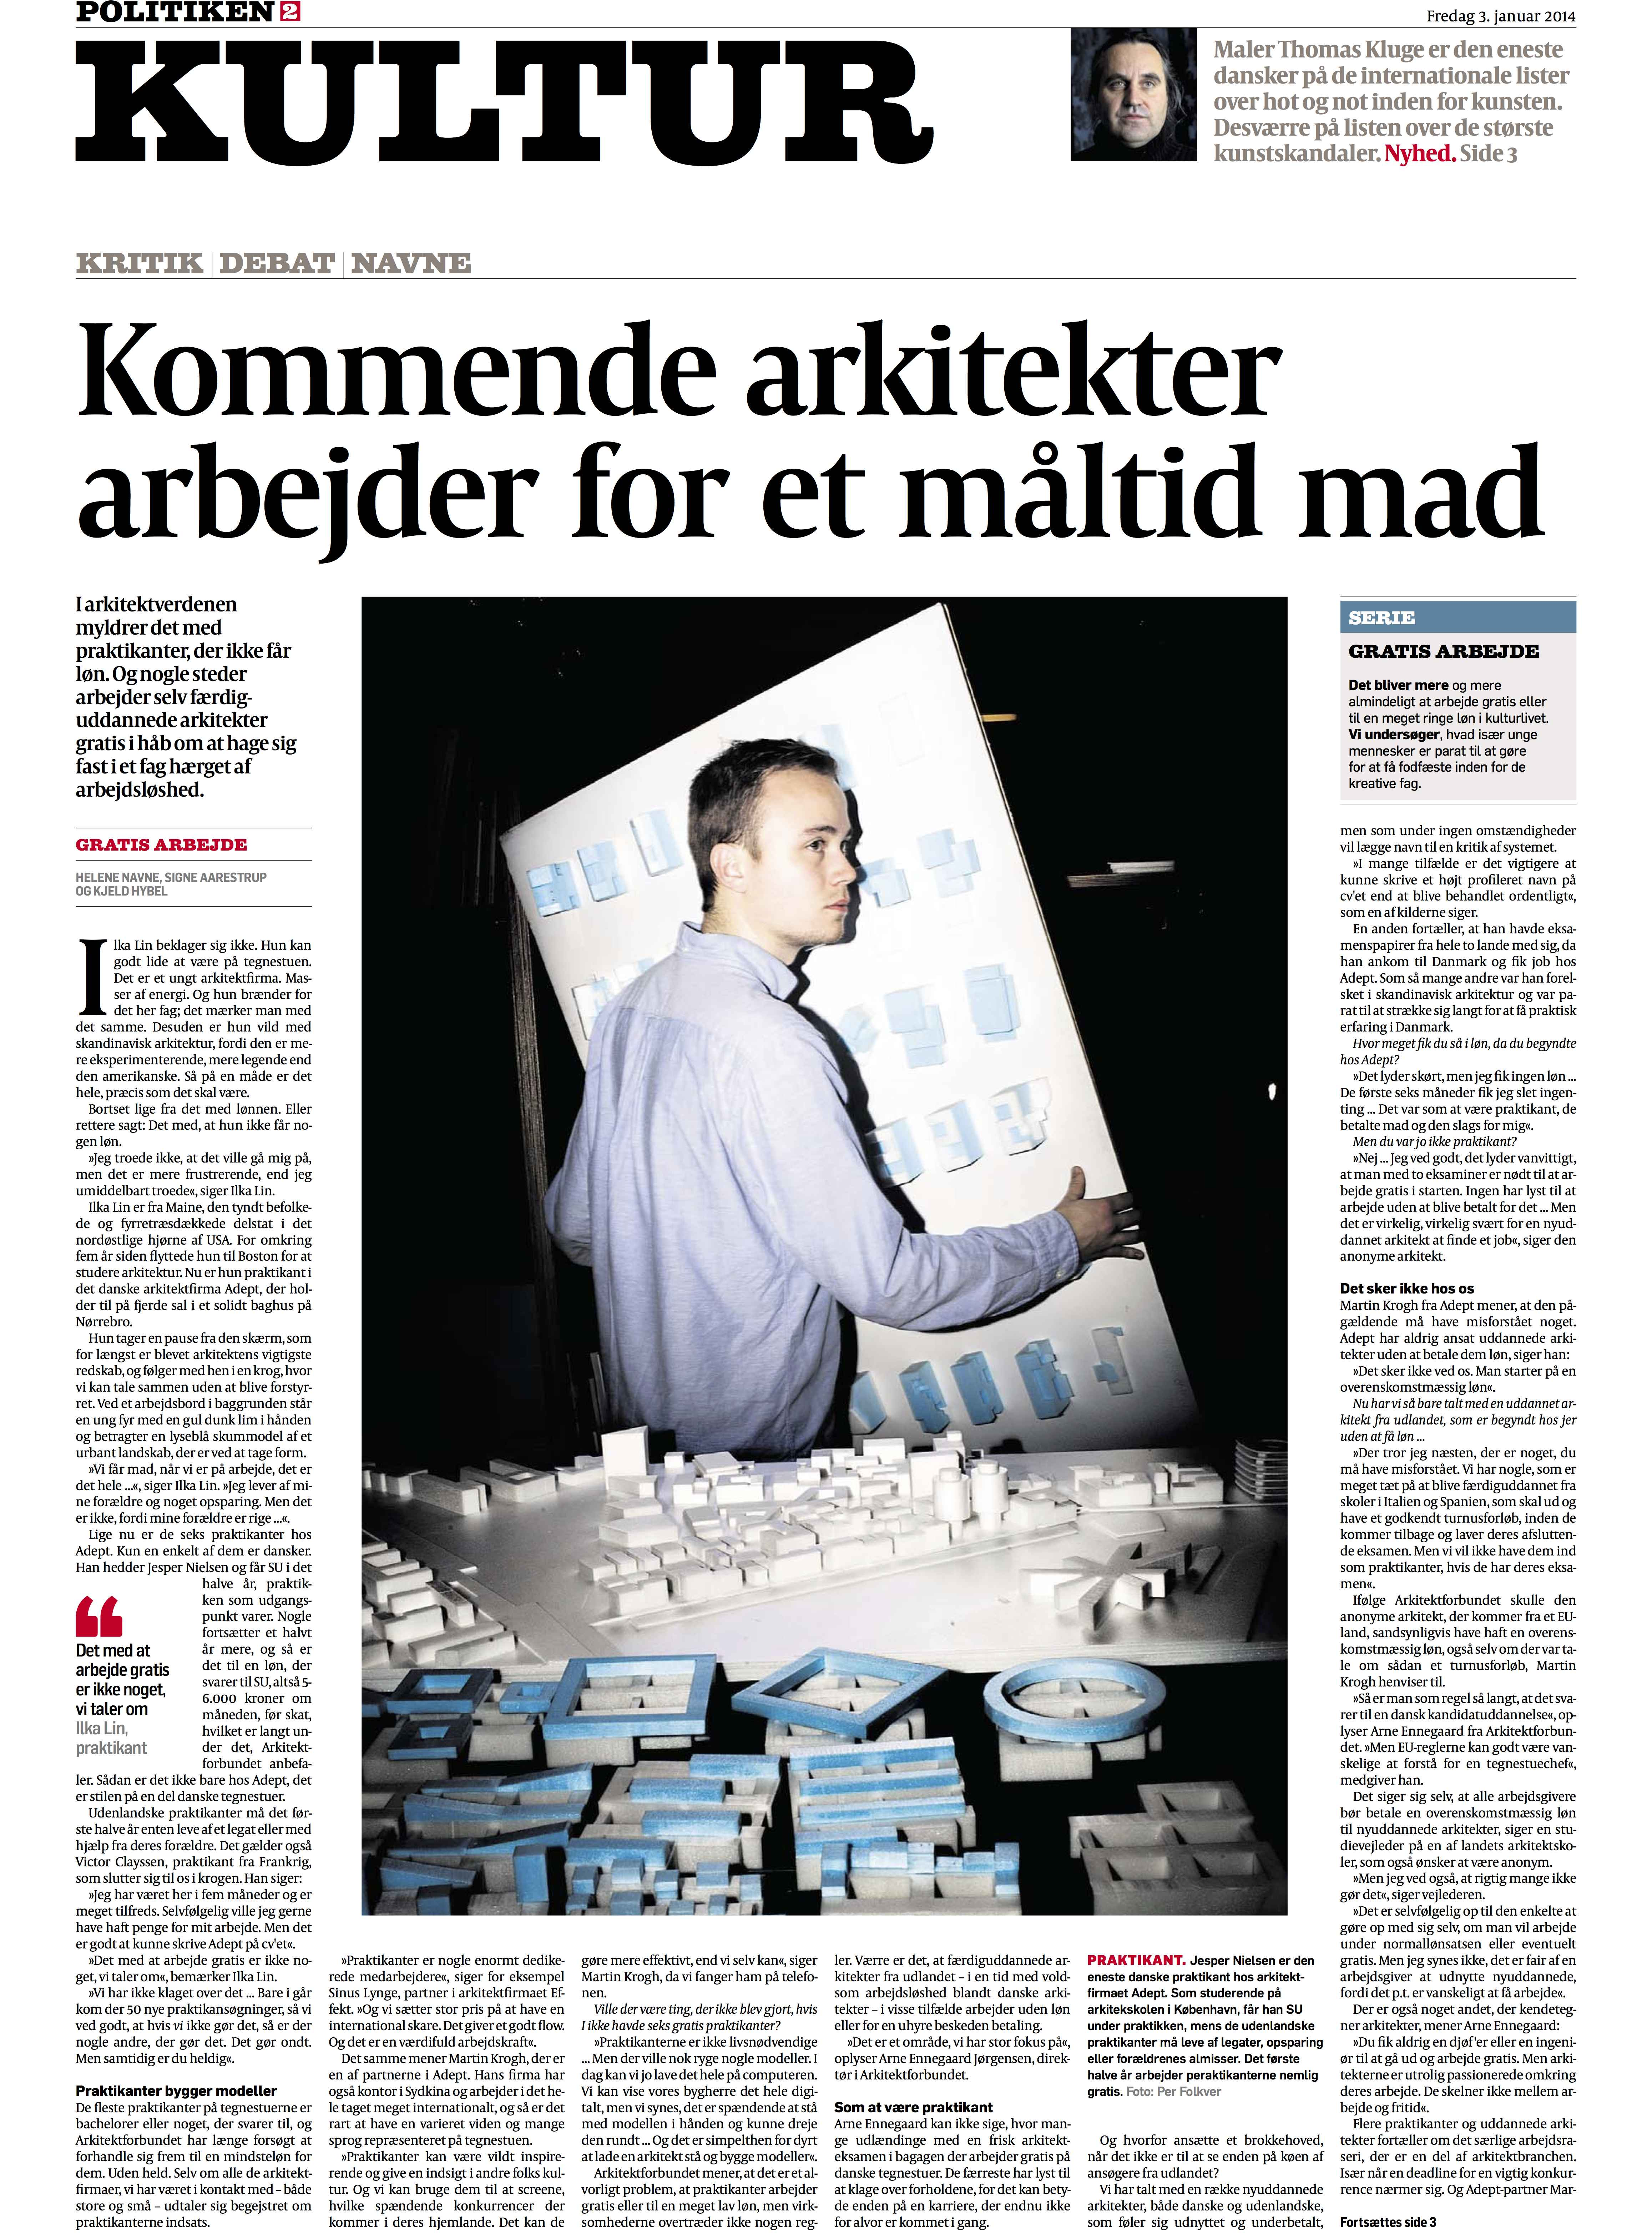 Politiken, Kultur s. 1 03.01.14